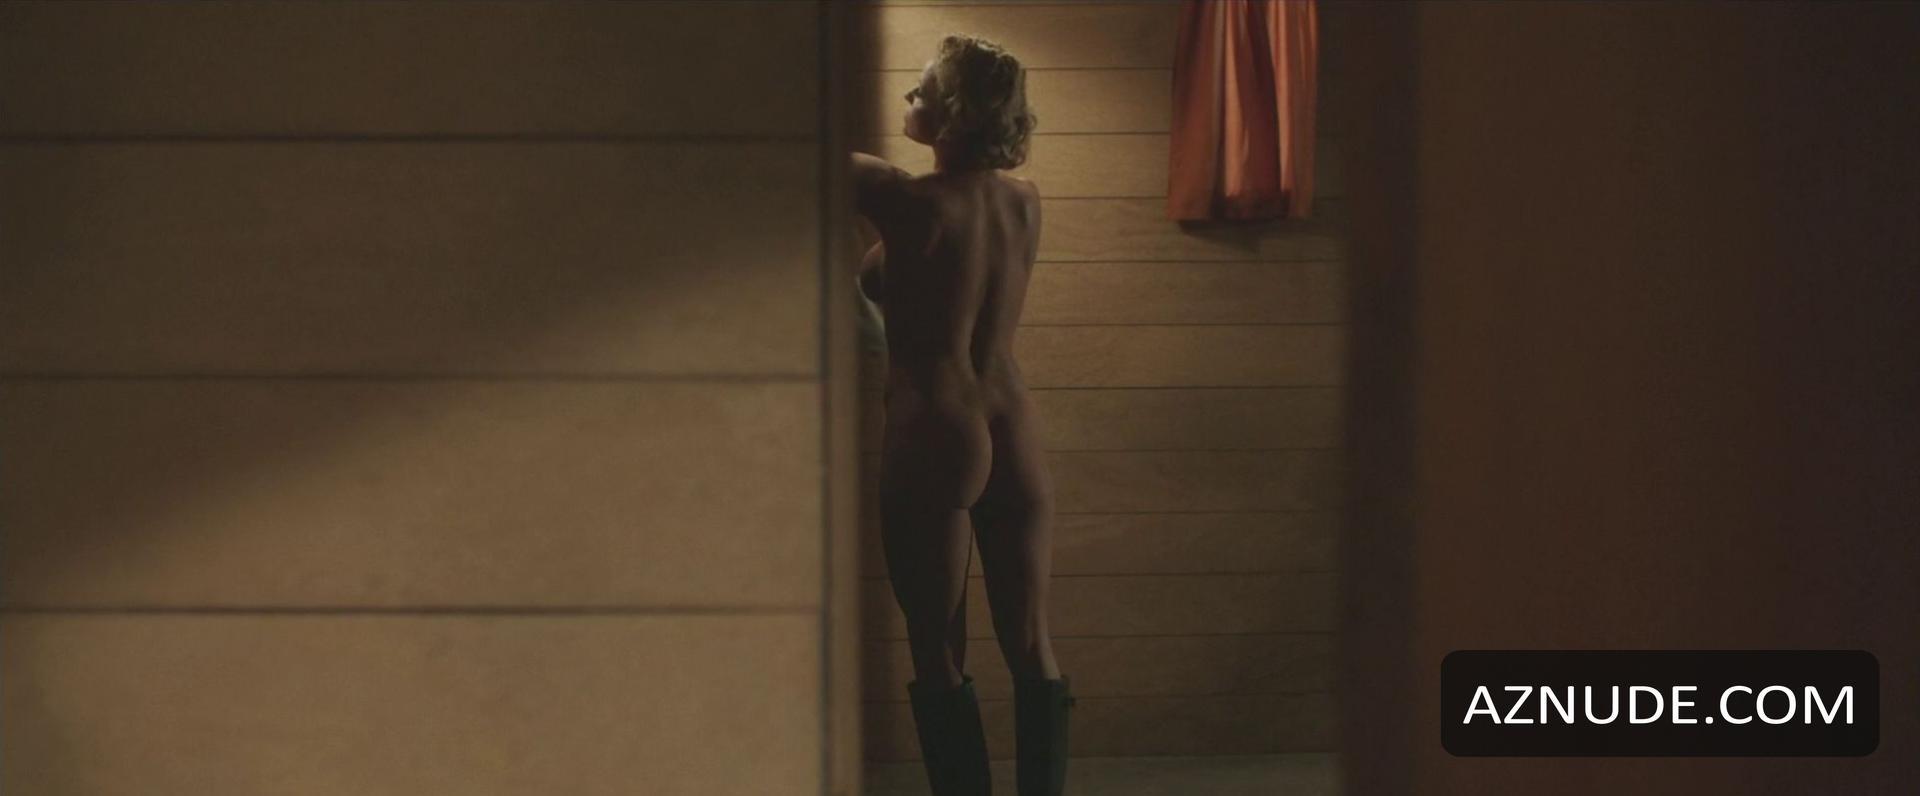 pamela anderson nude phots